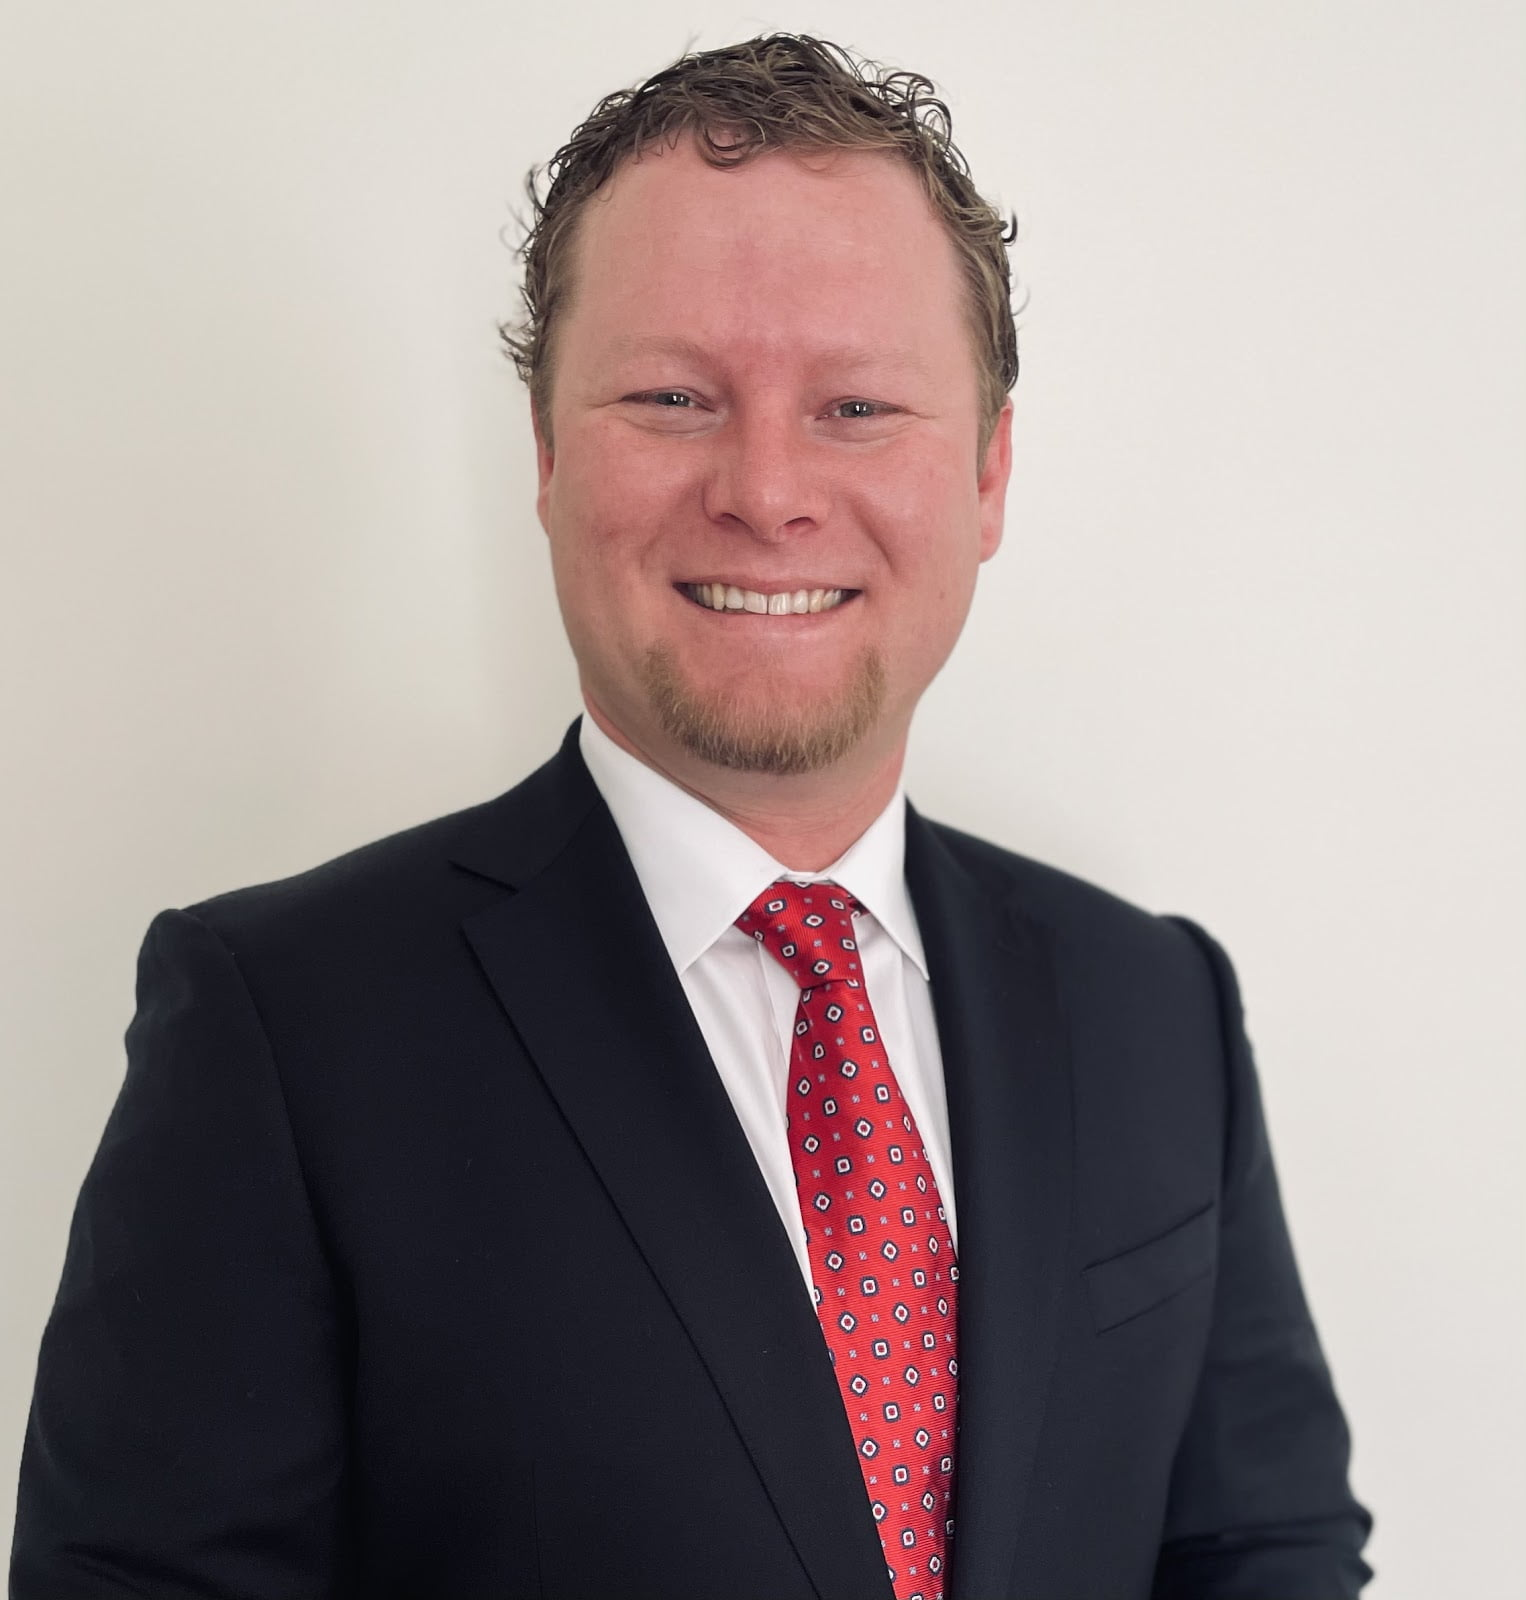 DLP Real Estate Capital Appoints Paul Wetmore as SVP of Construction & Development